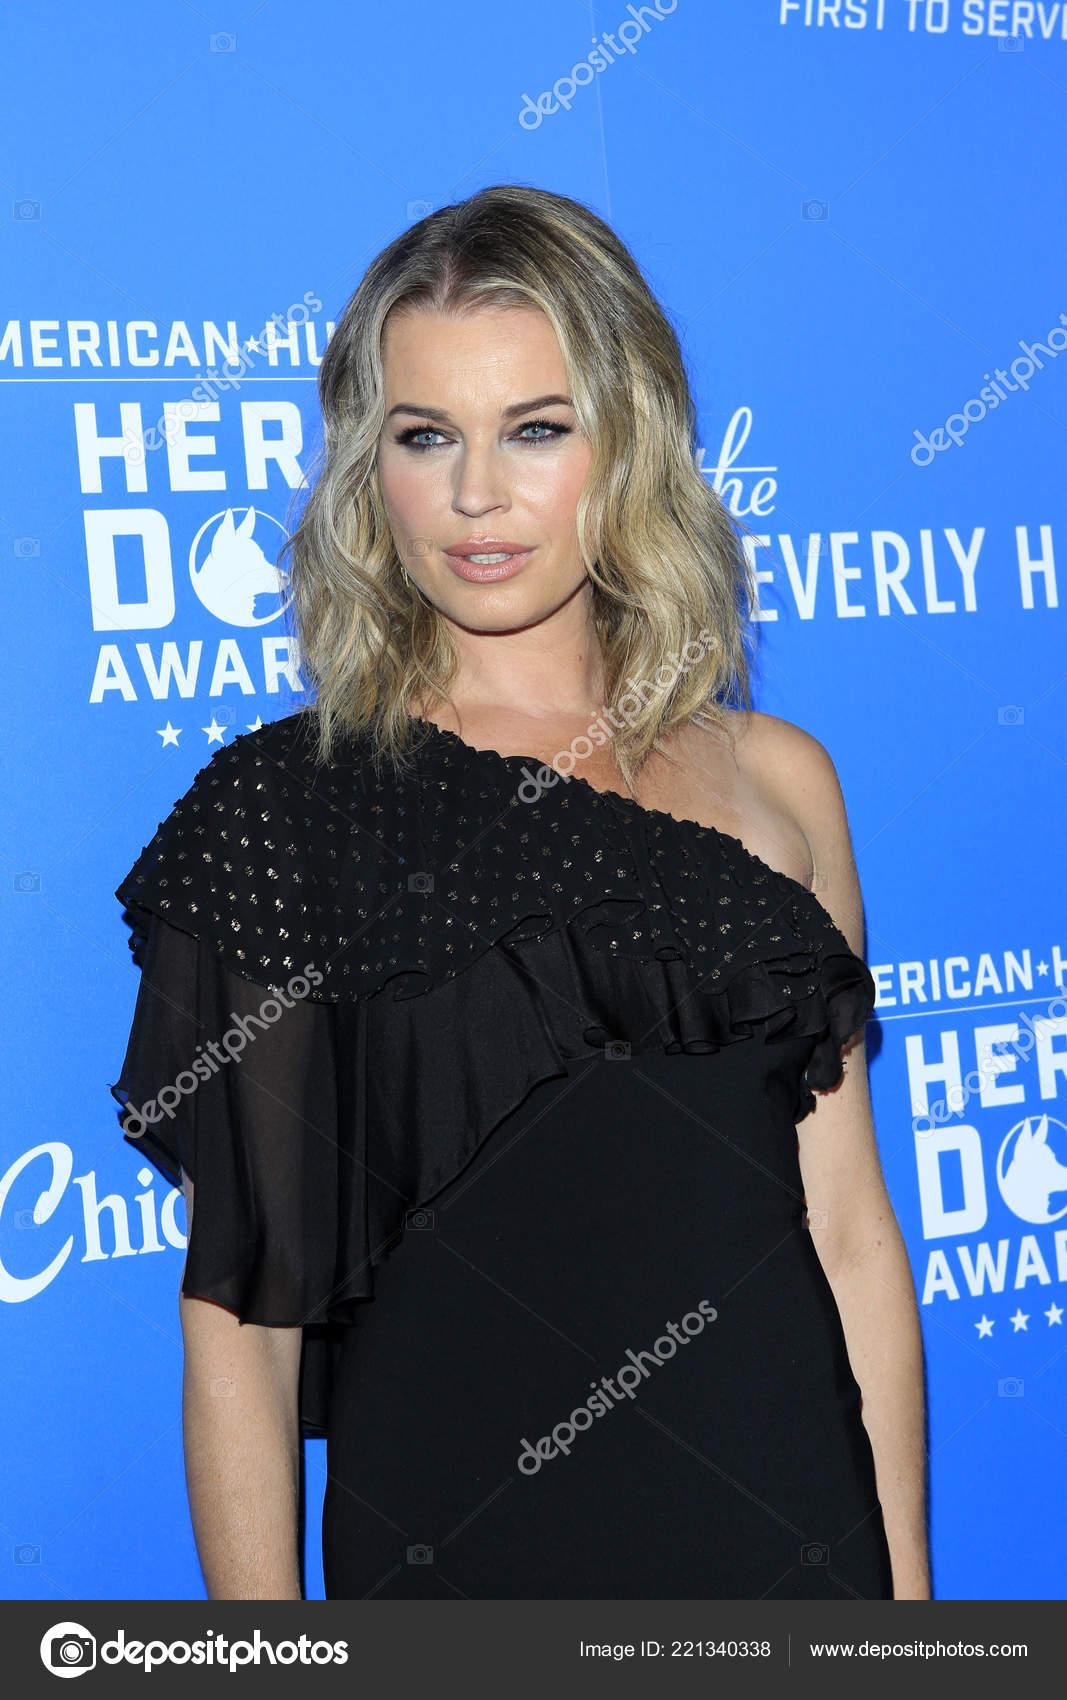 Michael Michele,Pamela Brown (actress) Adult video Nicole Eggert born January 13, 1972 (age 46),Ditta Kucsik HUN